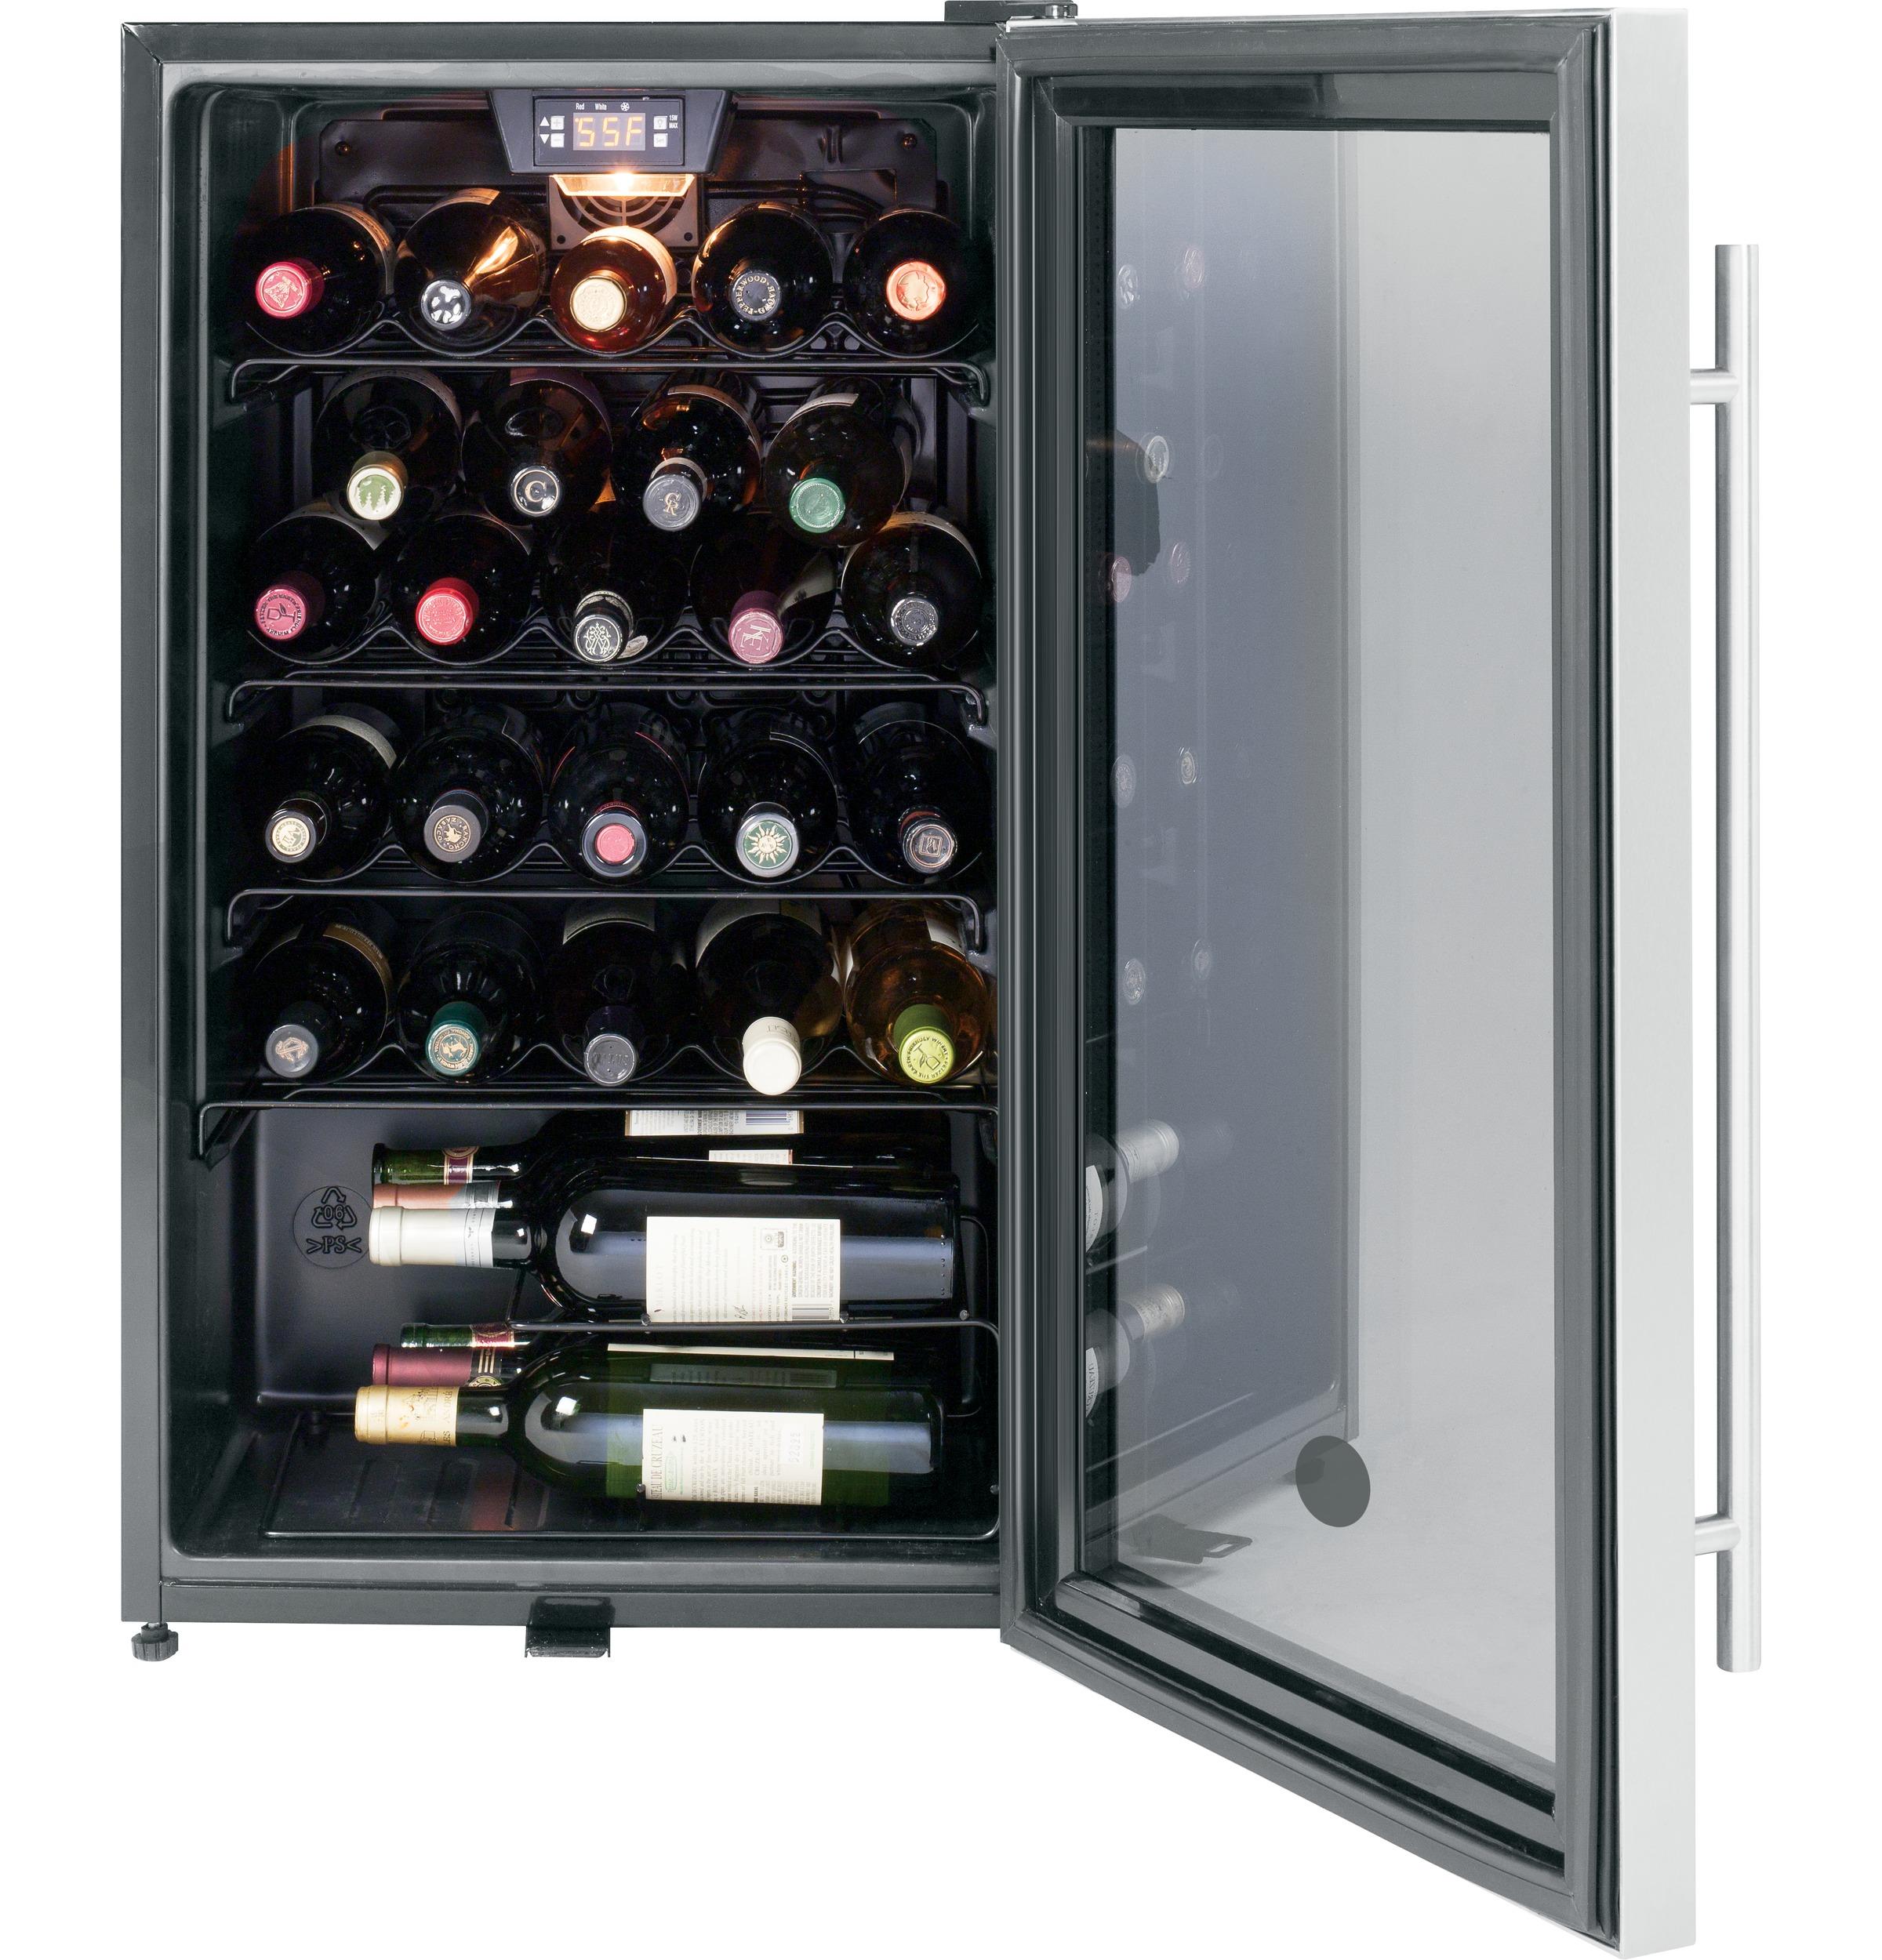 Model: GWS04HAESS | GE GE® Wine Center